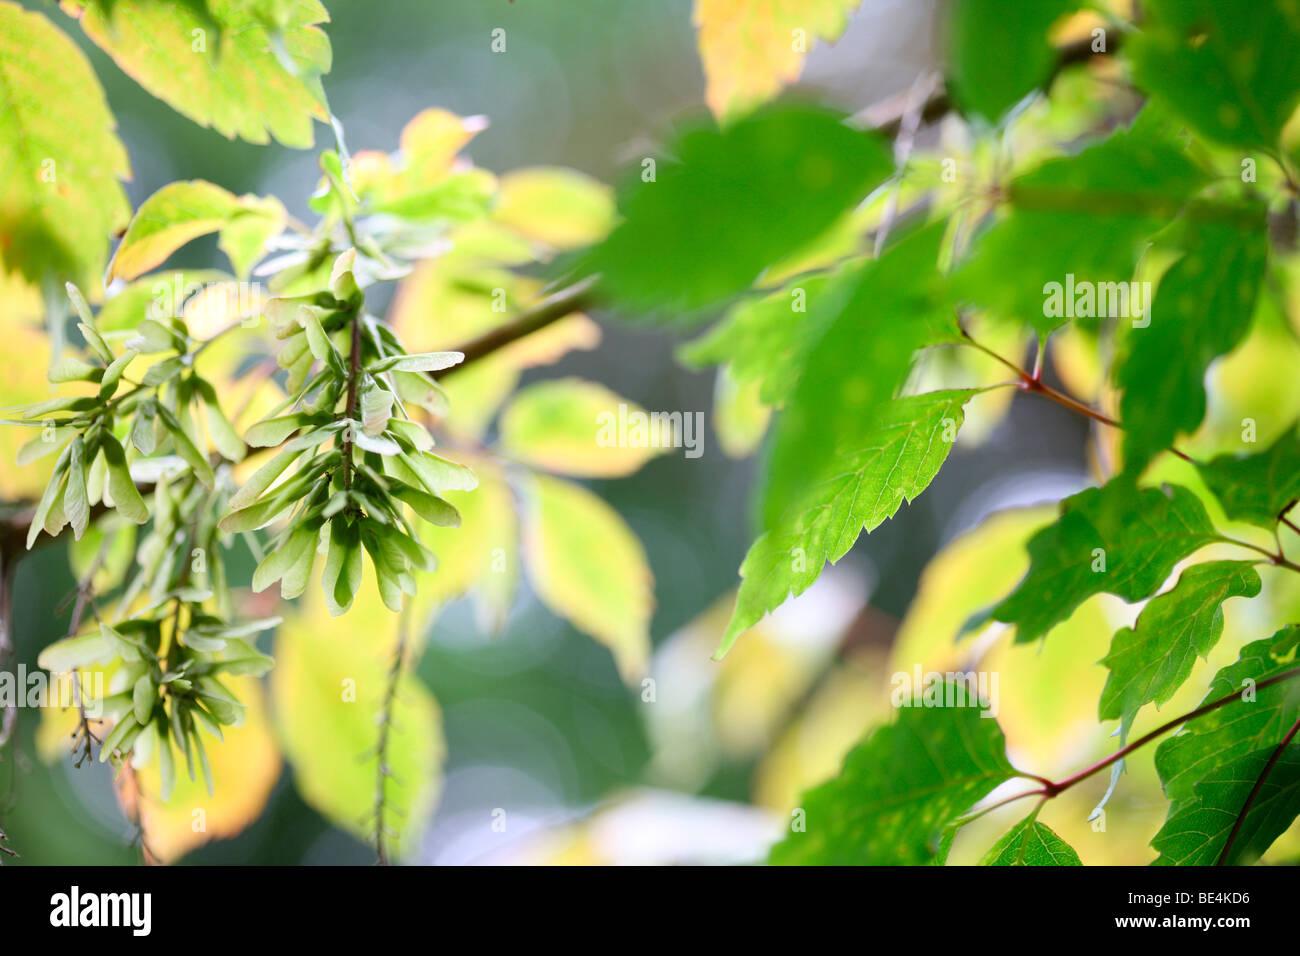 Vine Leaved Maple Acer Cissifolium Summer to Autumn Season Change - fine art photography Jane-Ann Butler Photography - Stock Image